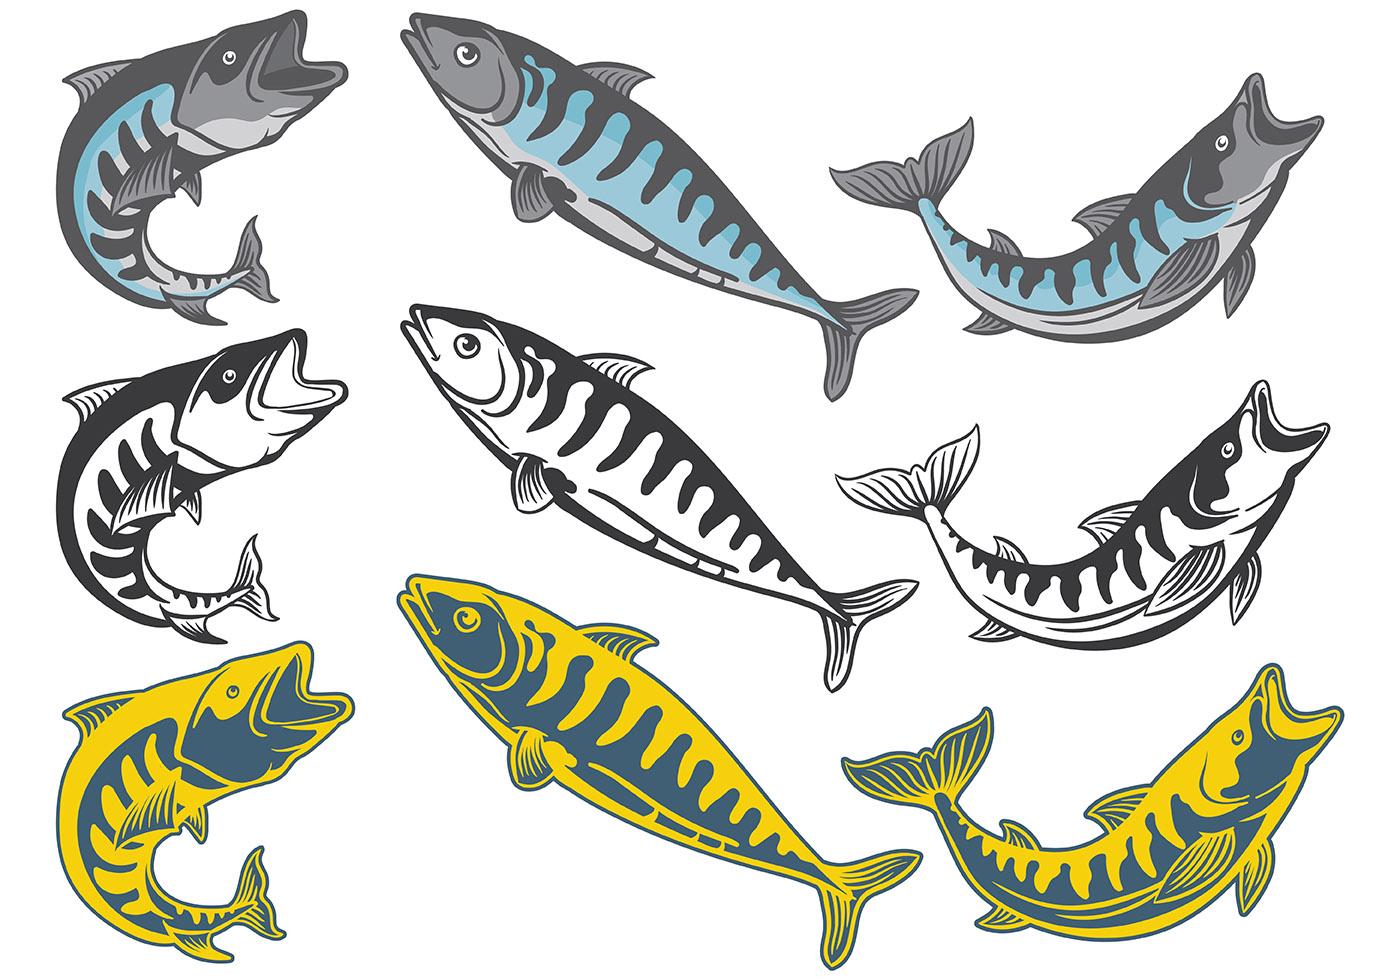 q版魚 免費下載 | 天天瘋後製